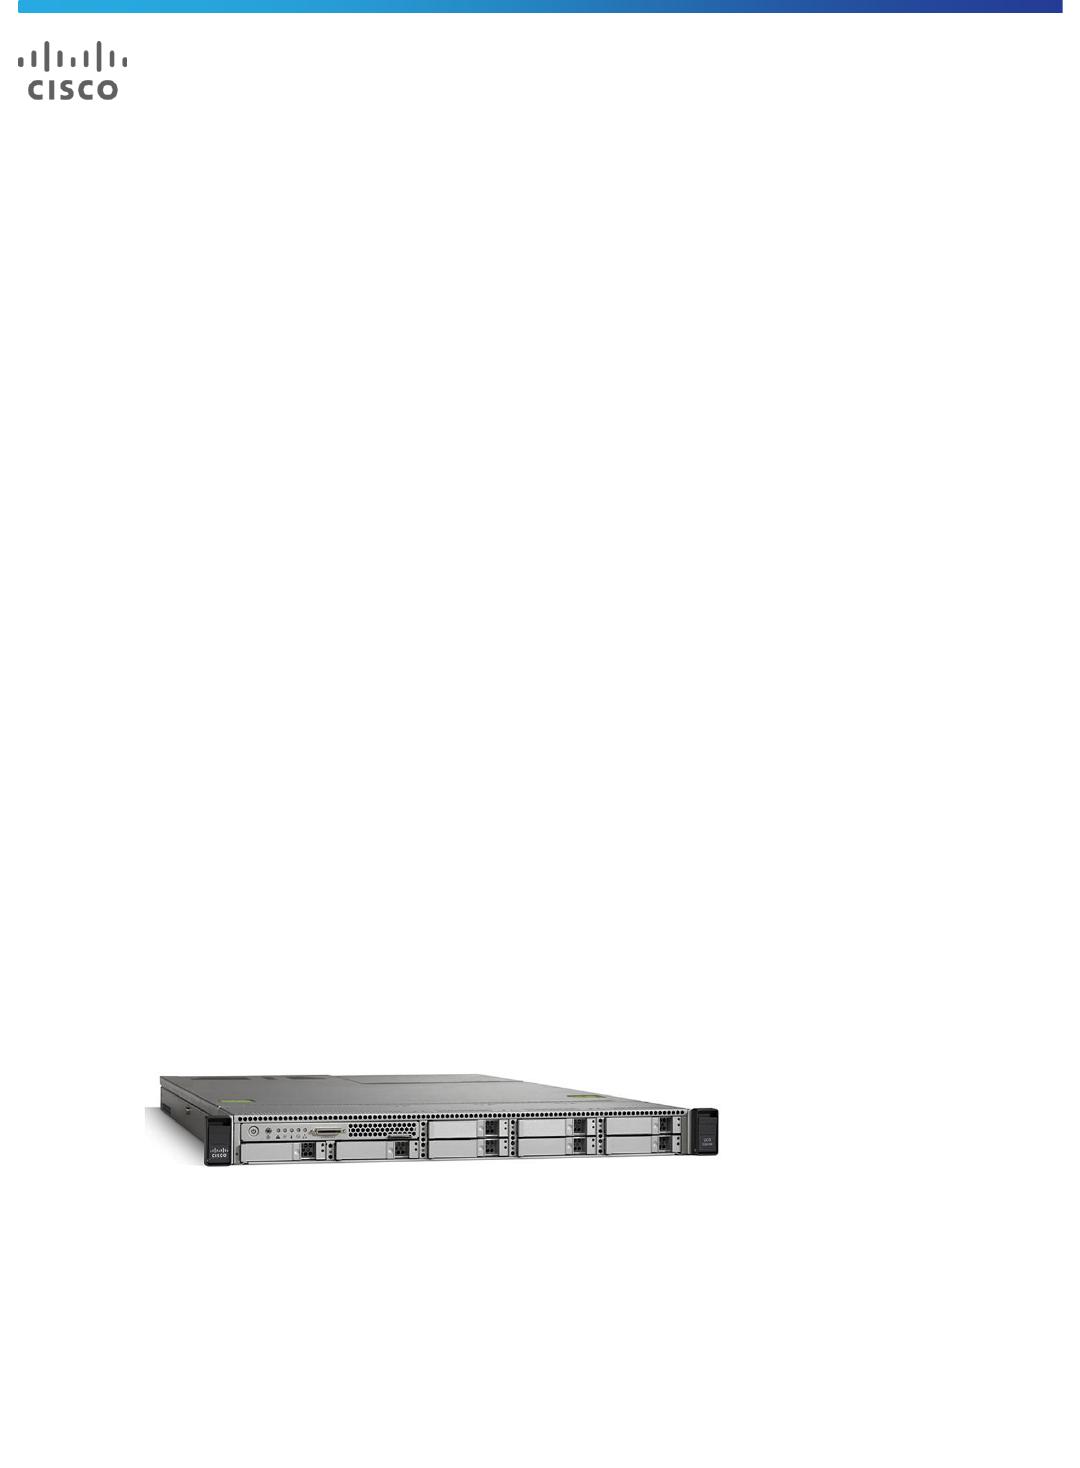 Cisco UCS C220 M3 Rack Server Data Sheet C78 700626